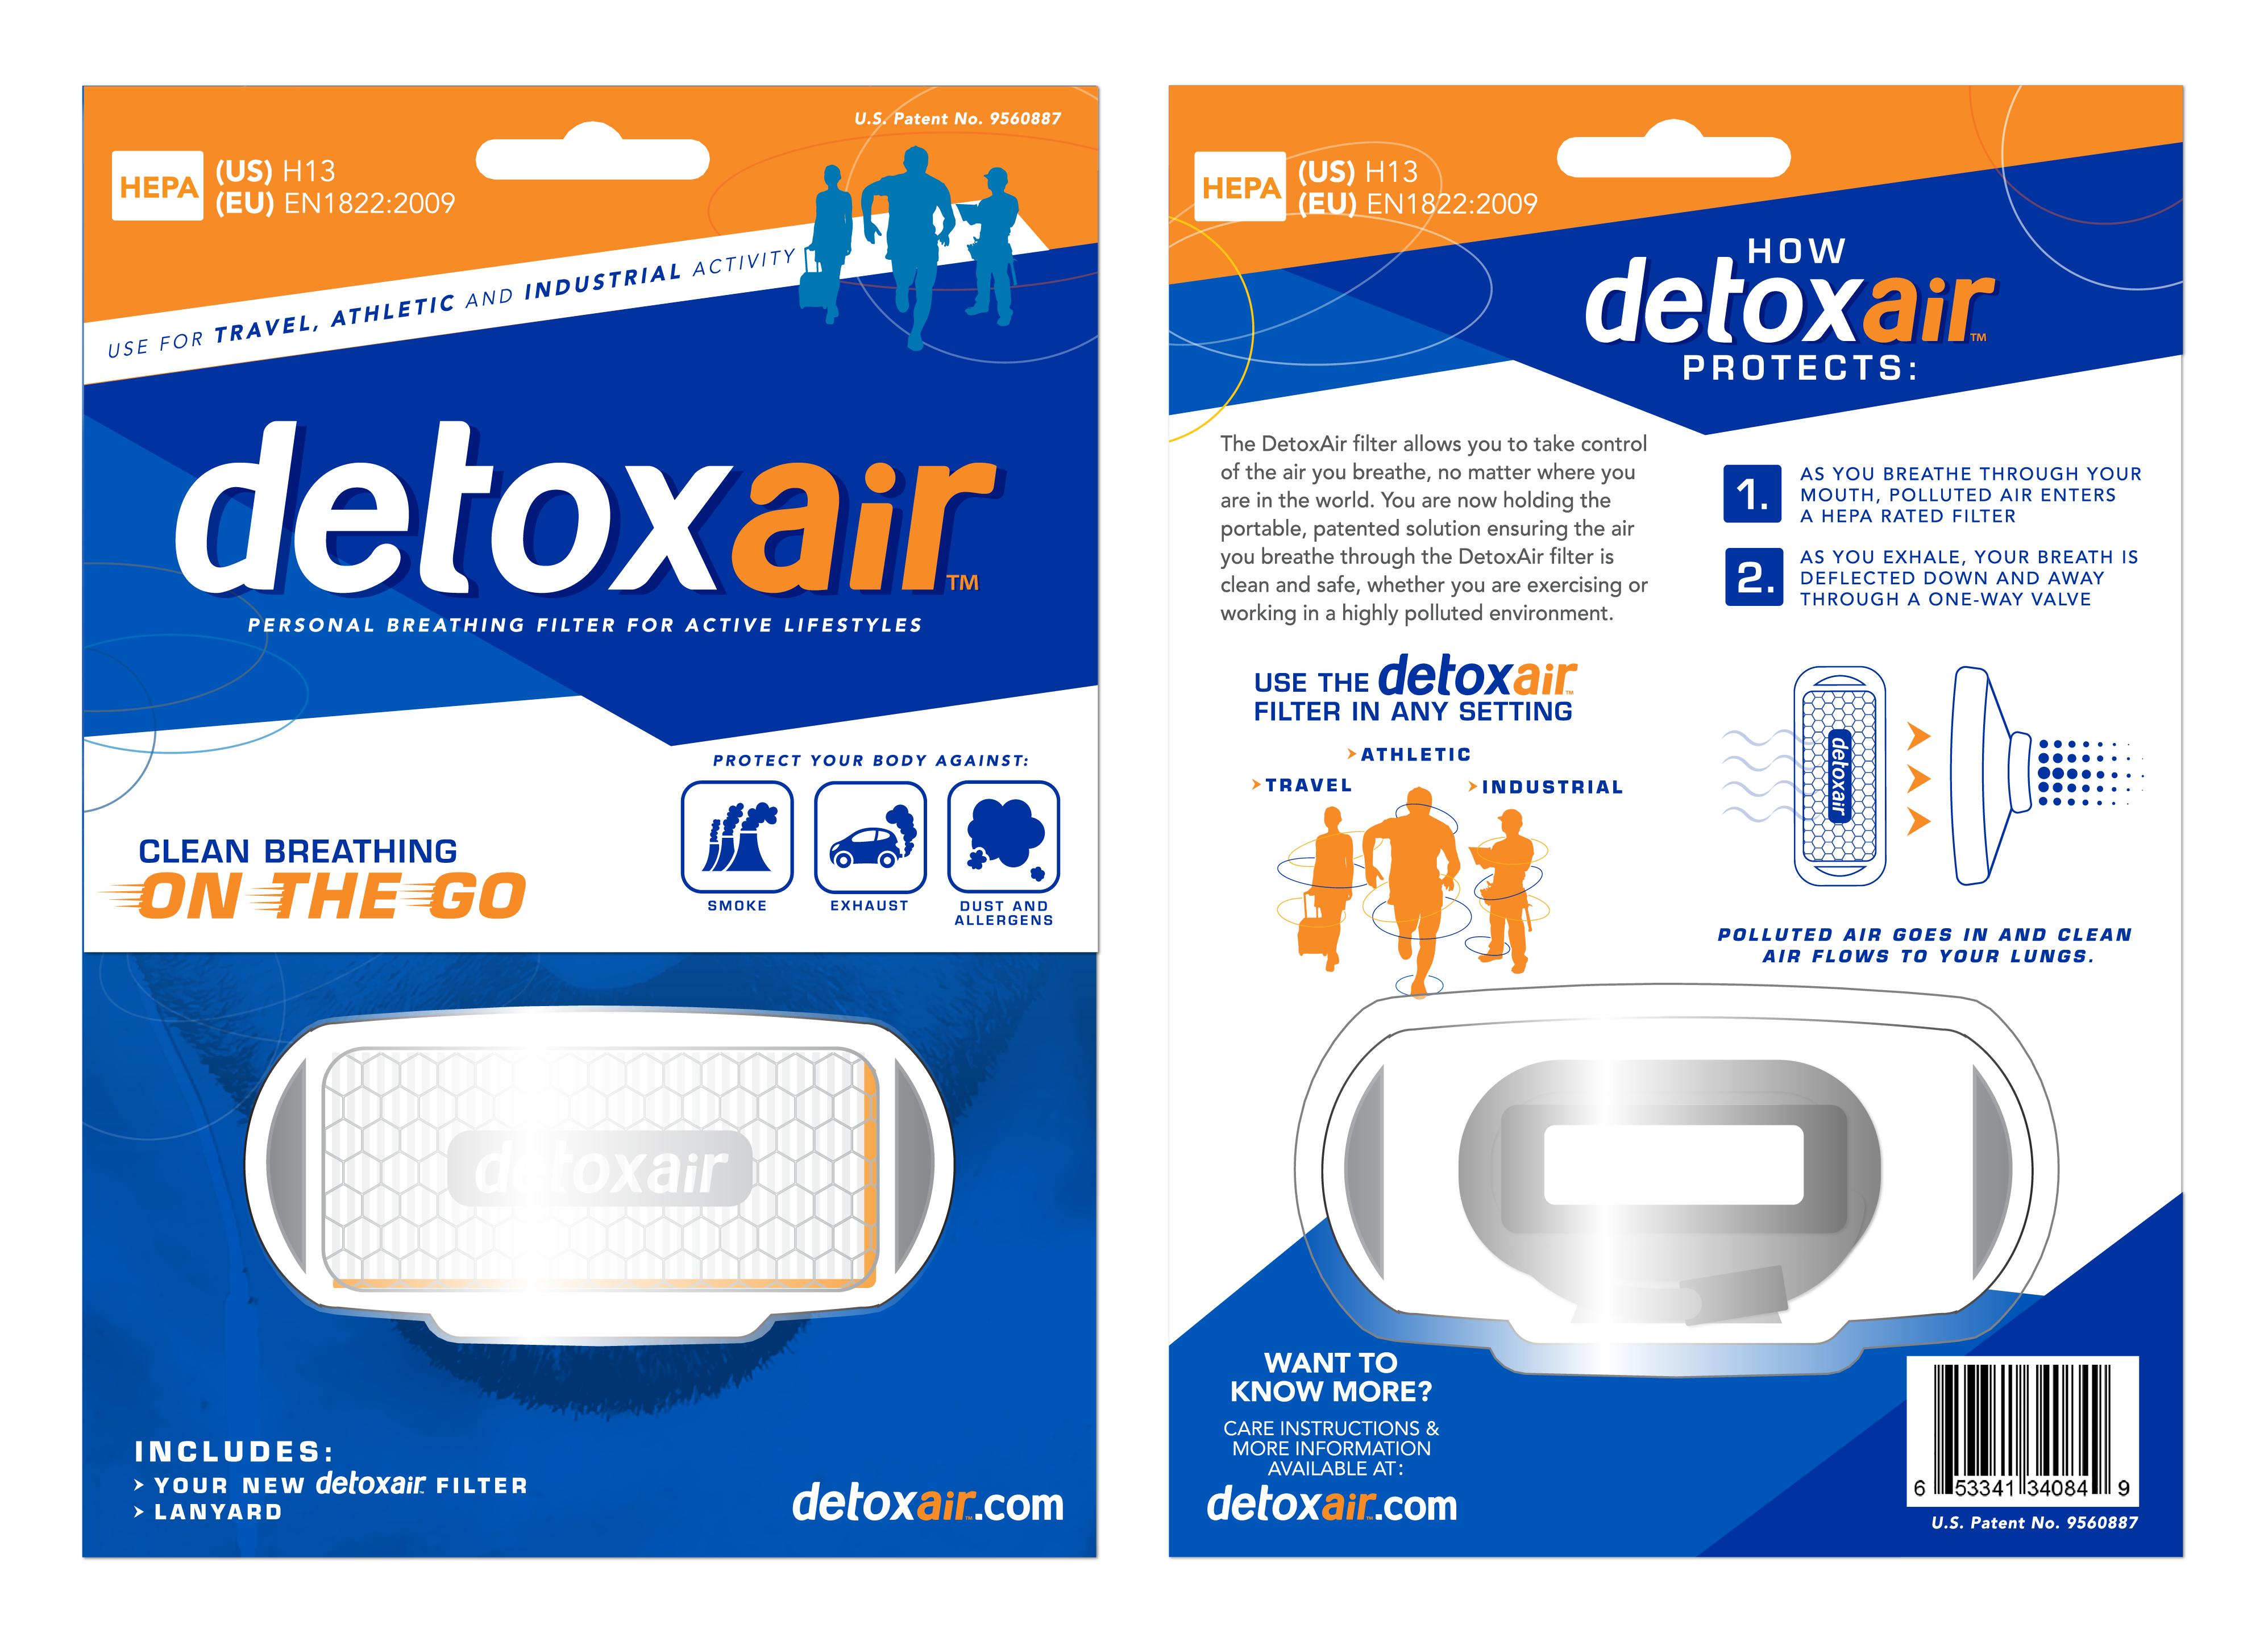 DetoxAir-Packaging-Design.png